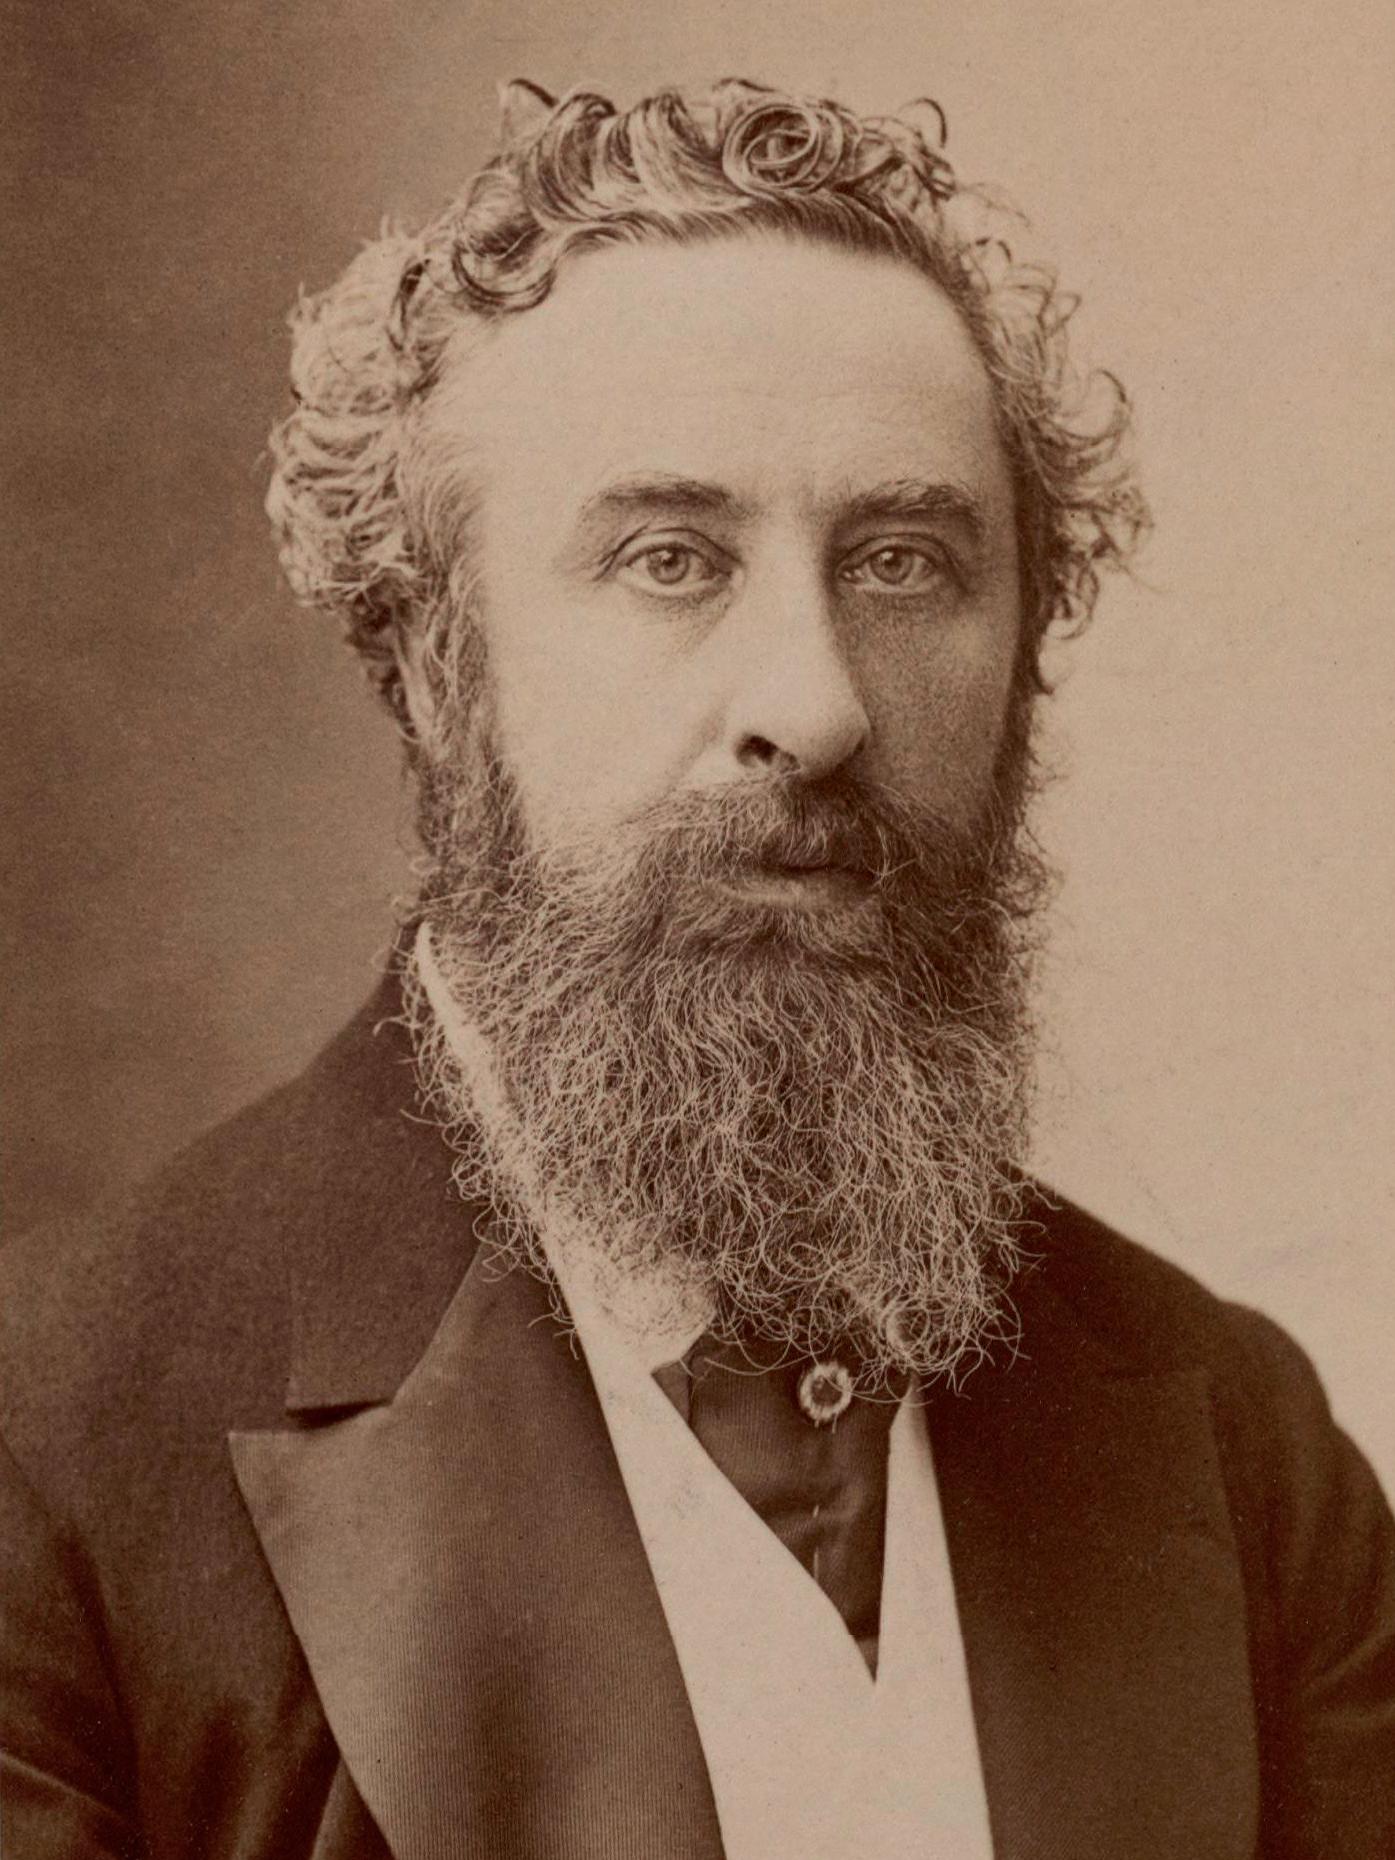 Robert Bulwer-Lytton, 1st Earl of Lytton - Wikipedia